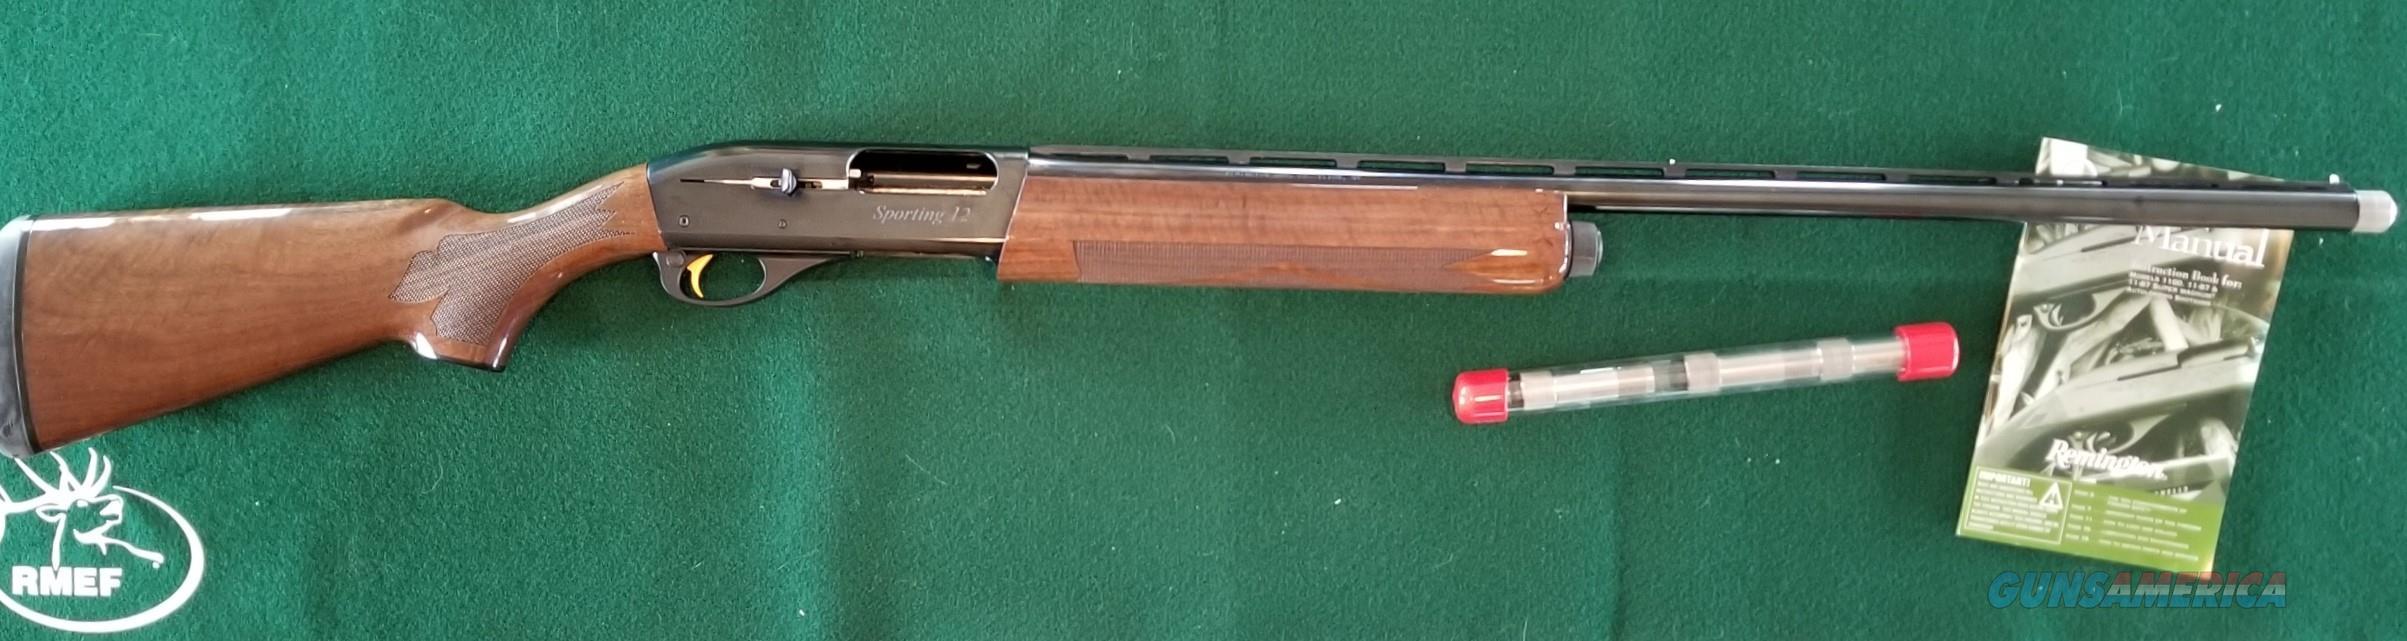 "New Remington 1100 Sporting 12 Gauge 28"" barrel  Guns > Shotguns > Remington Shotguns  > Autoloaders > Hunting"